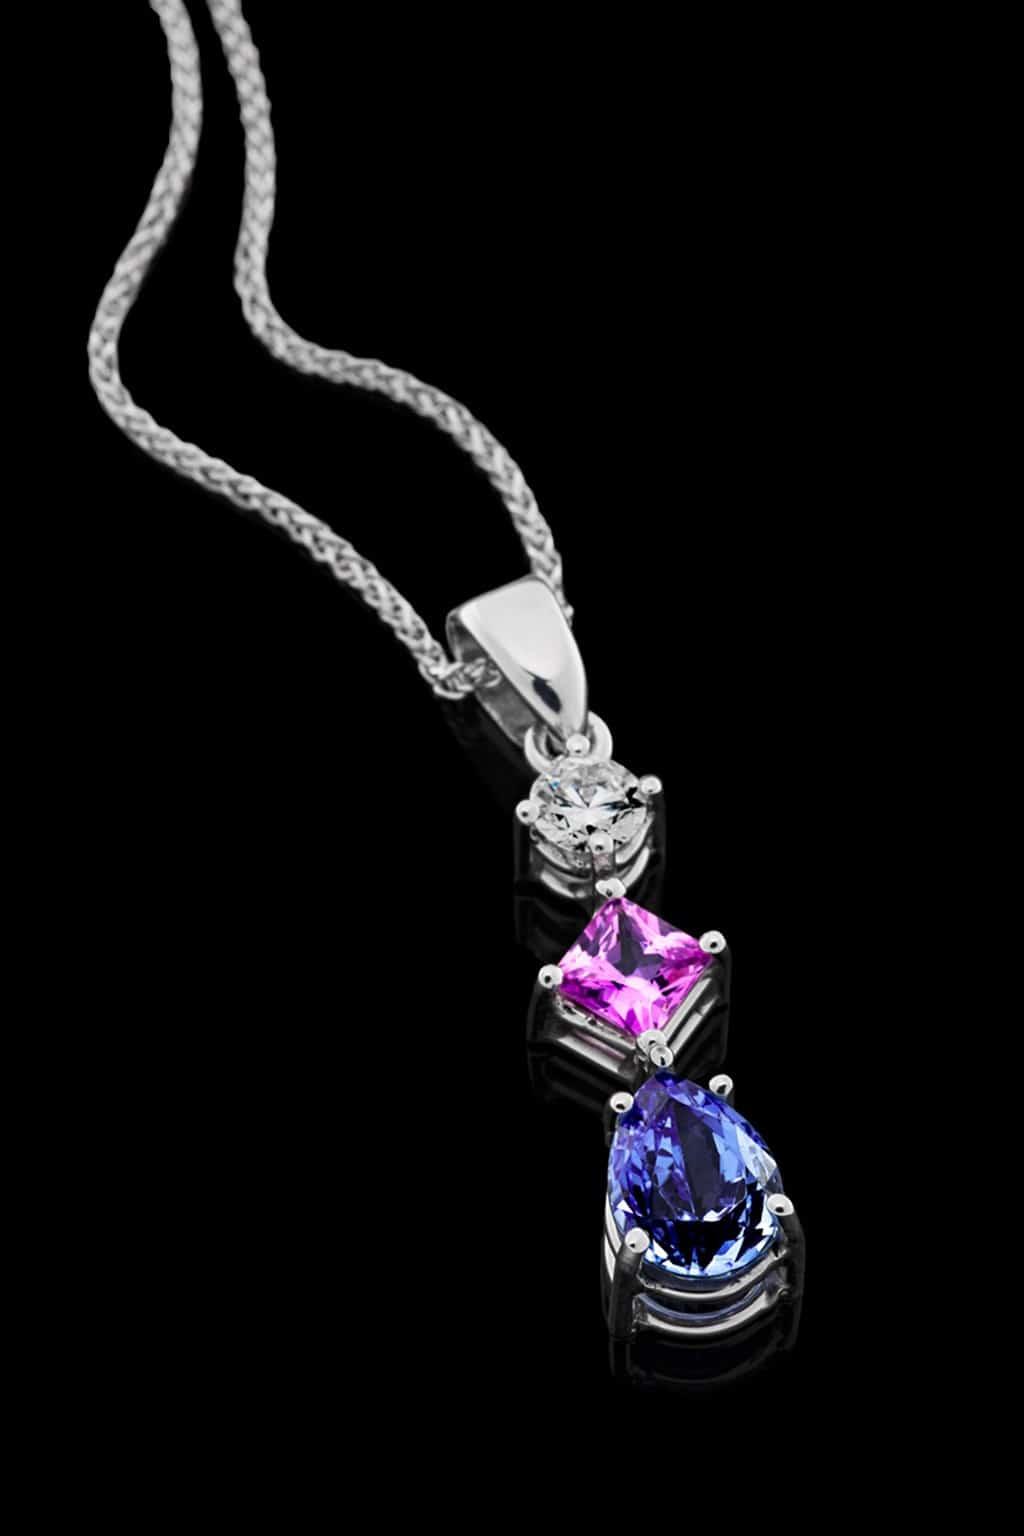 Pink Carat Handmade Necklace